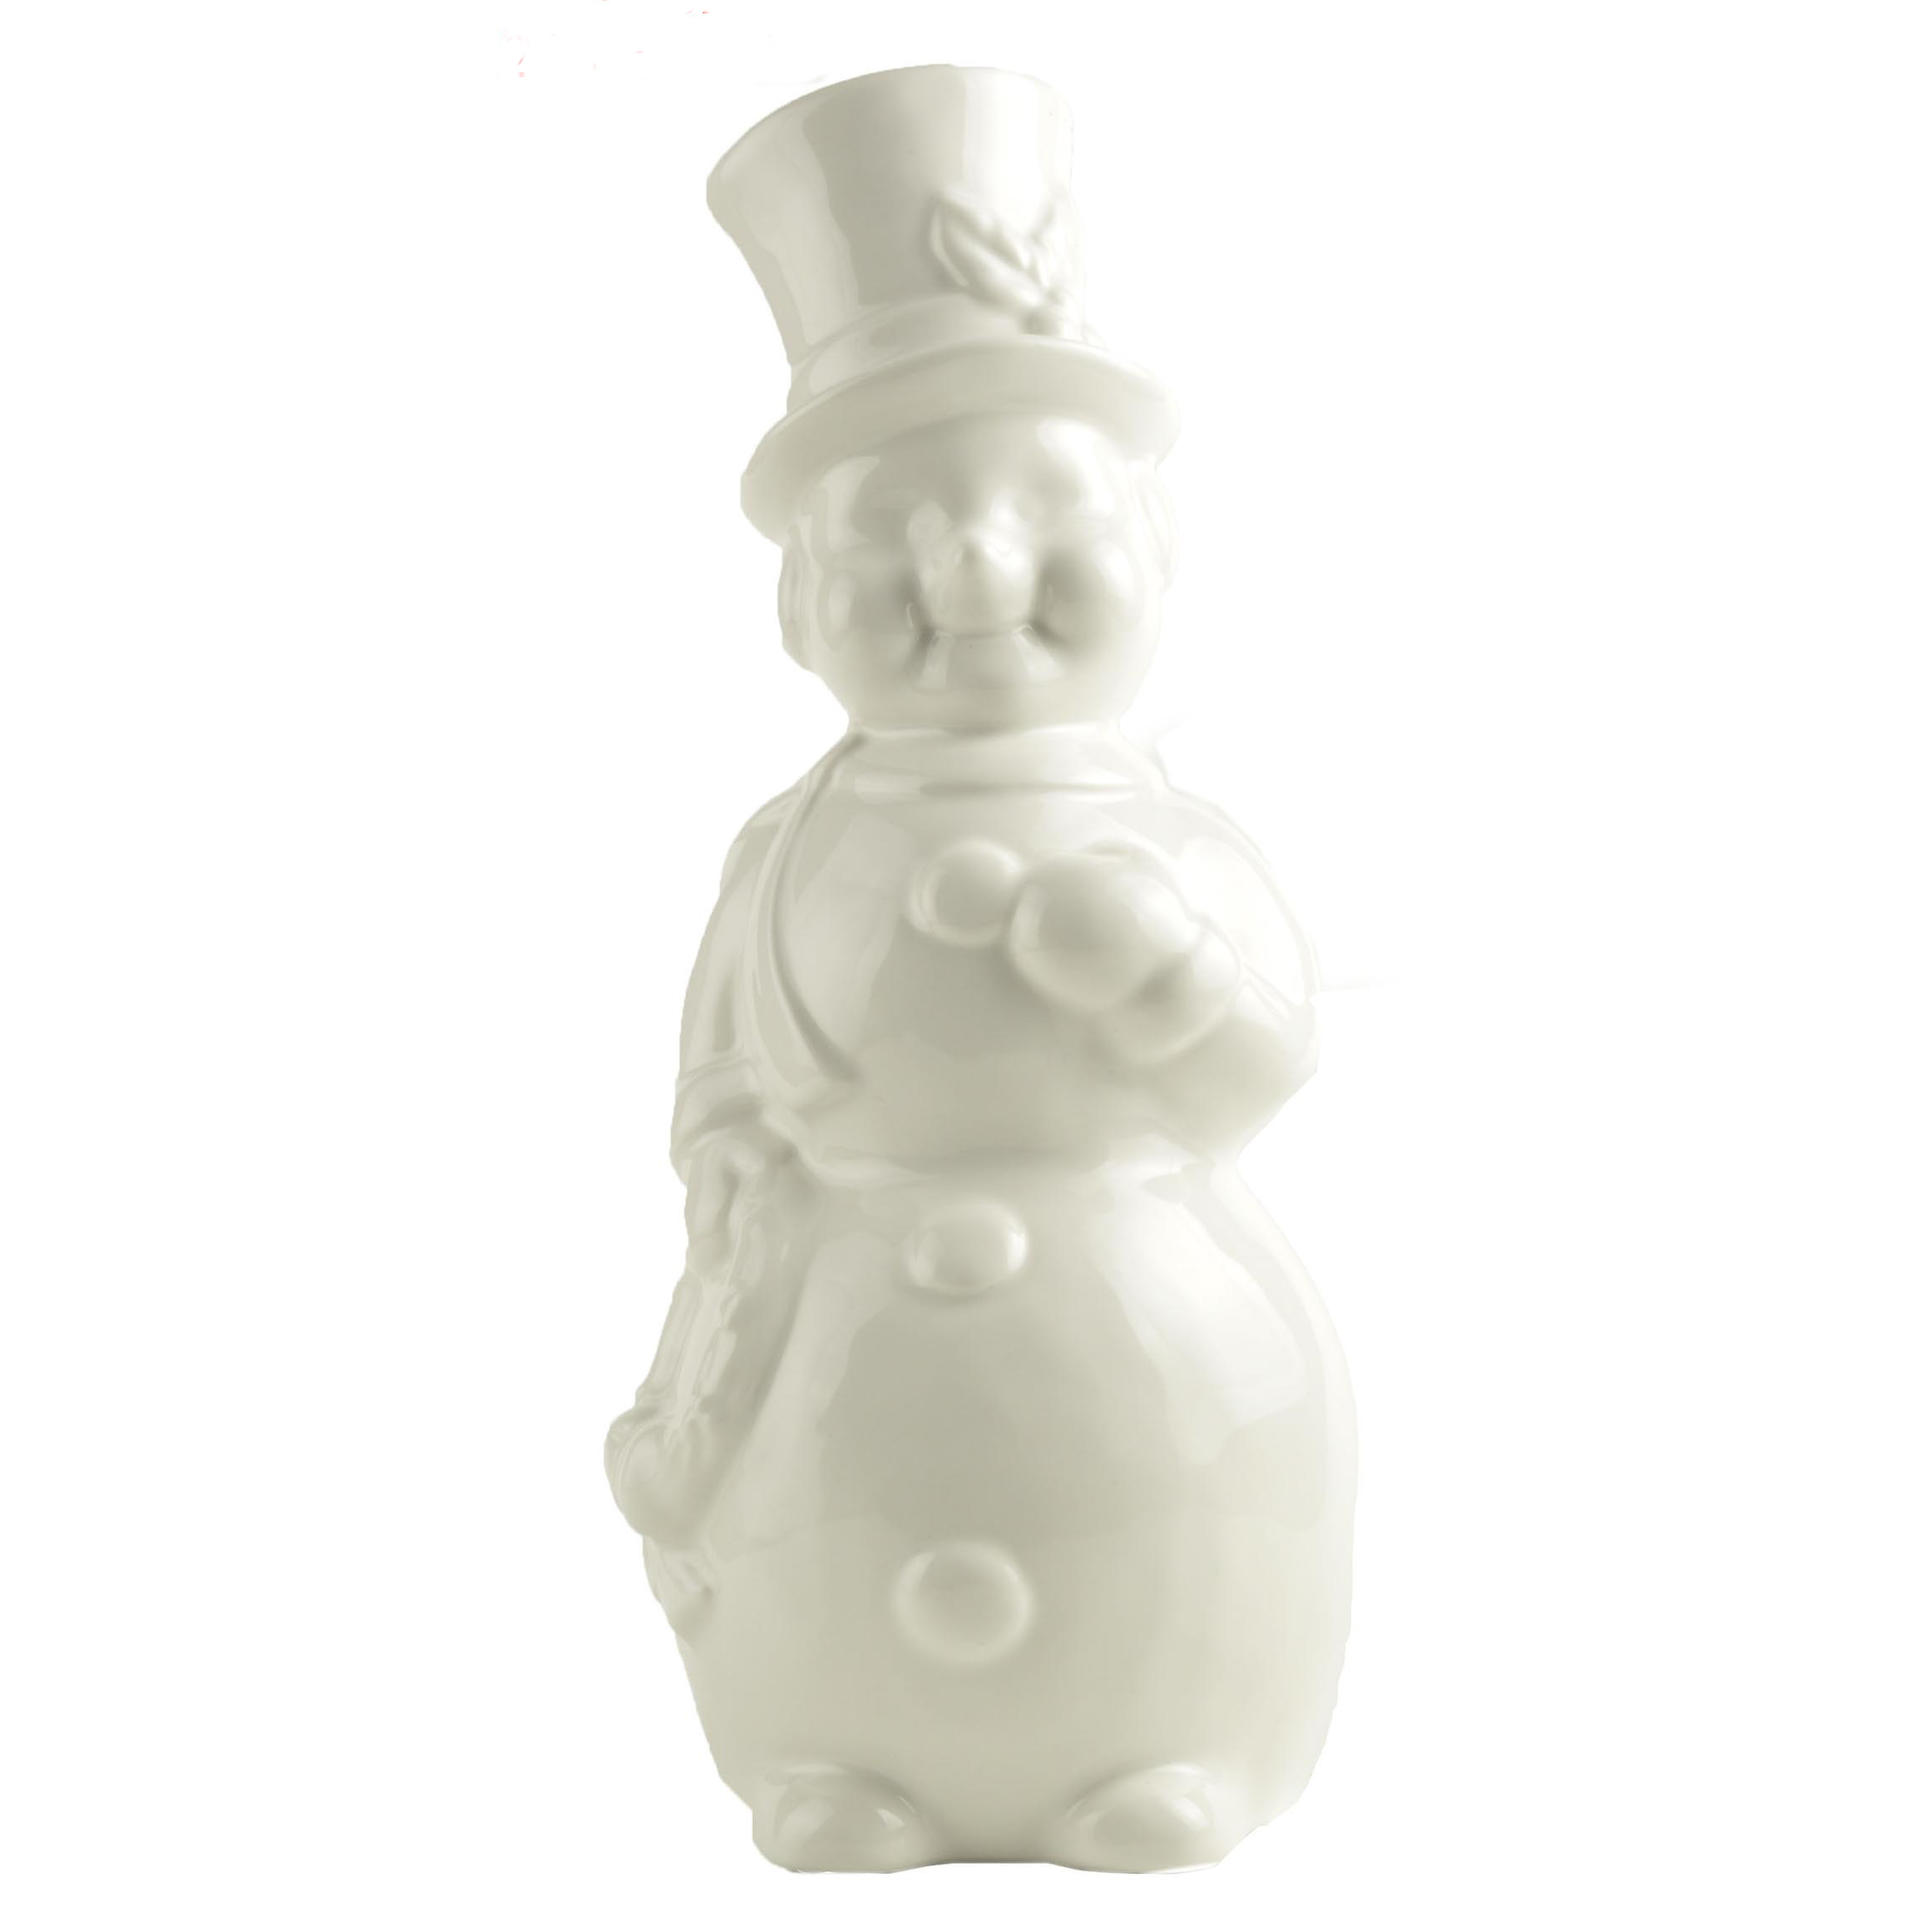 Hot sale New custom design personalized White Ceramic Snowman Decor Christmas home decoration